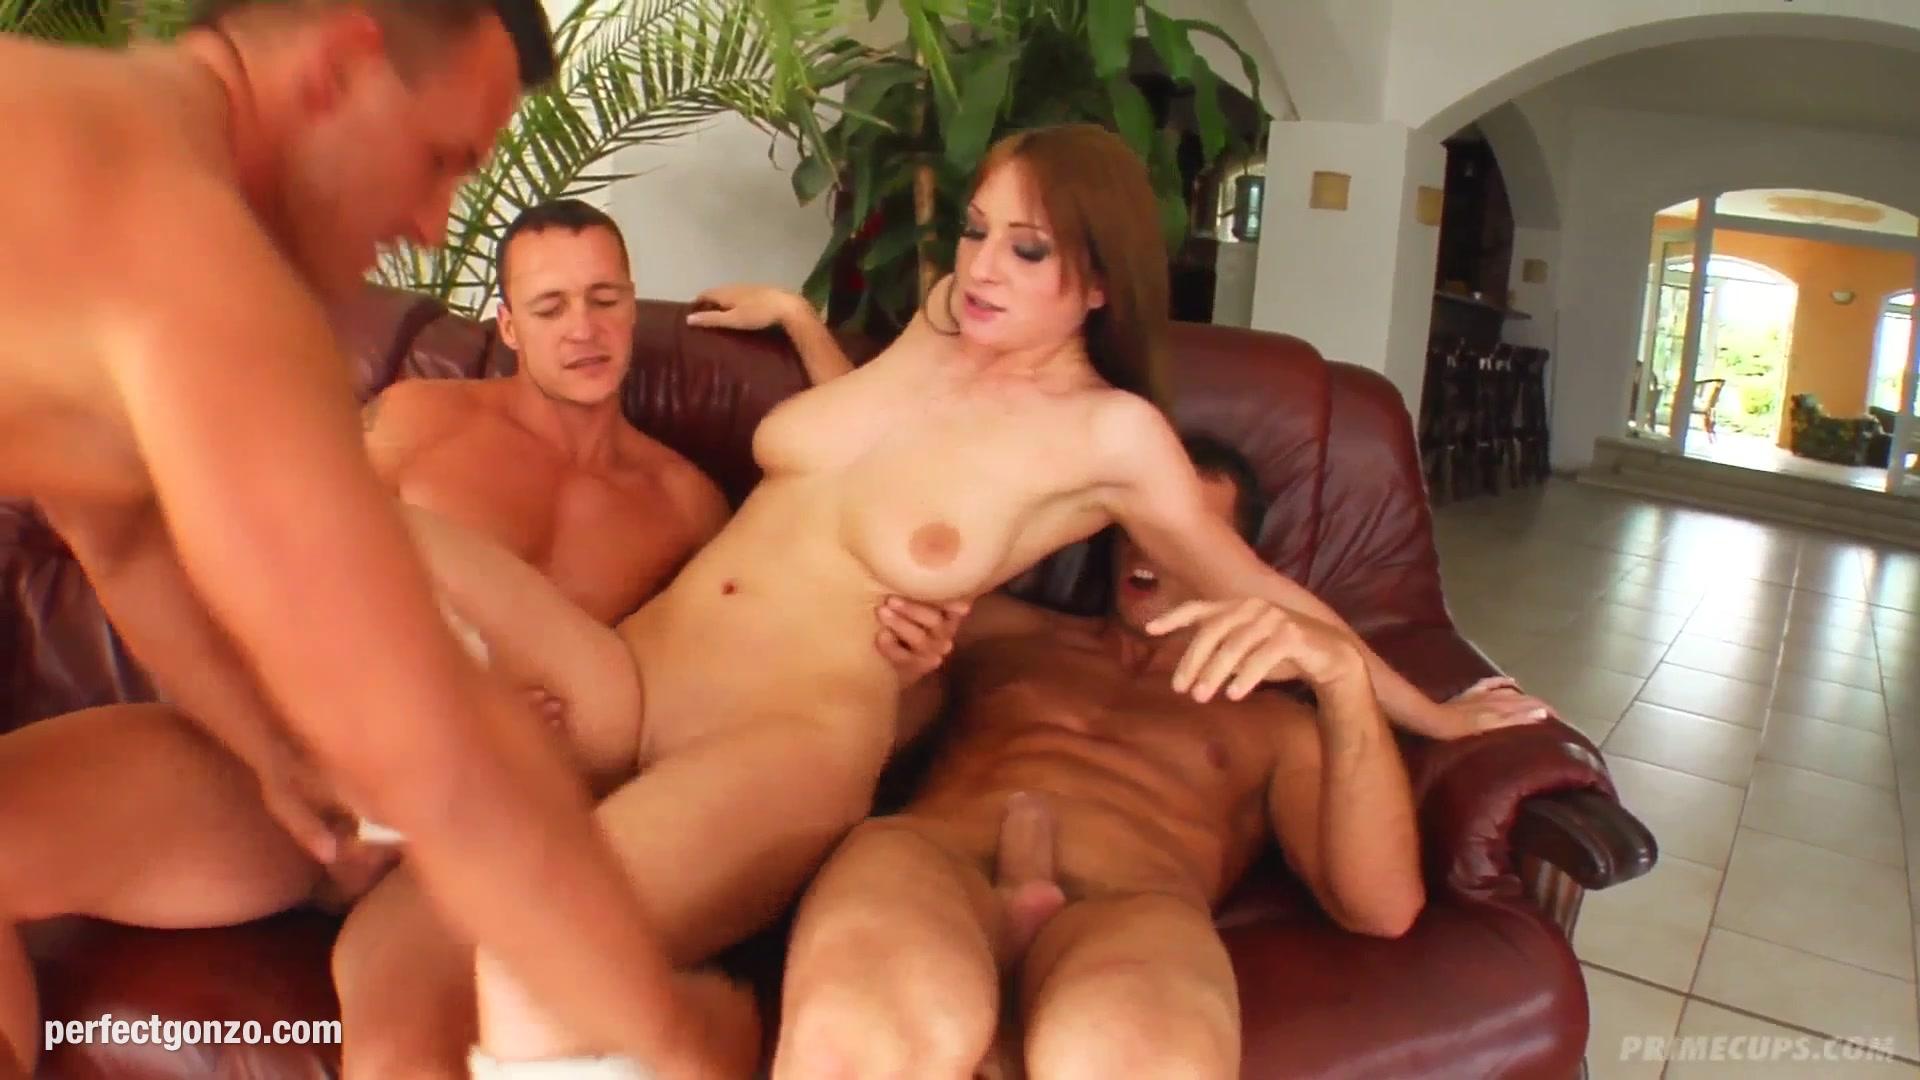 Julia ann porn threesome Sexy Photo